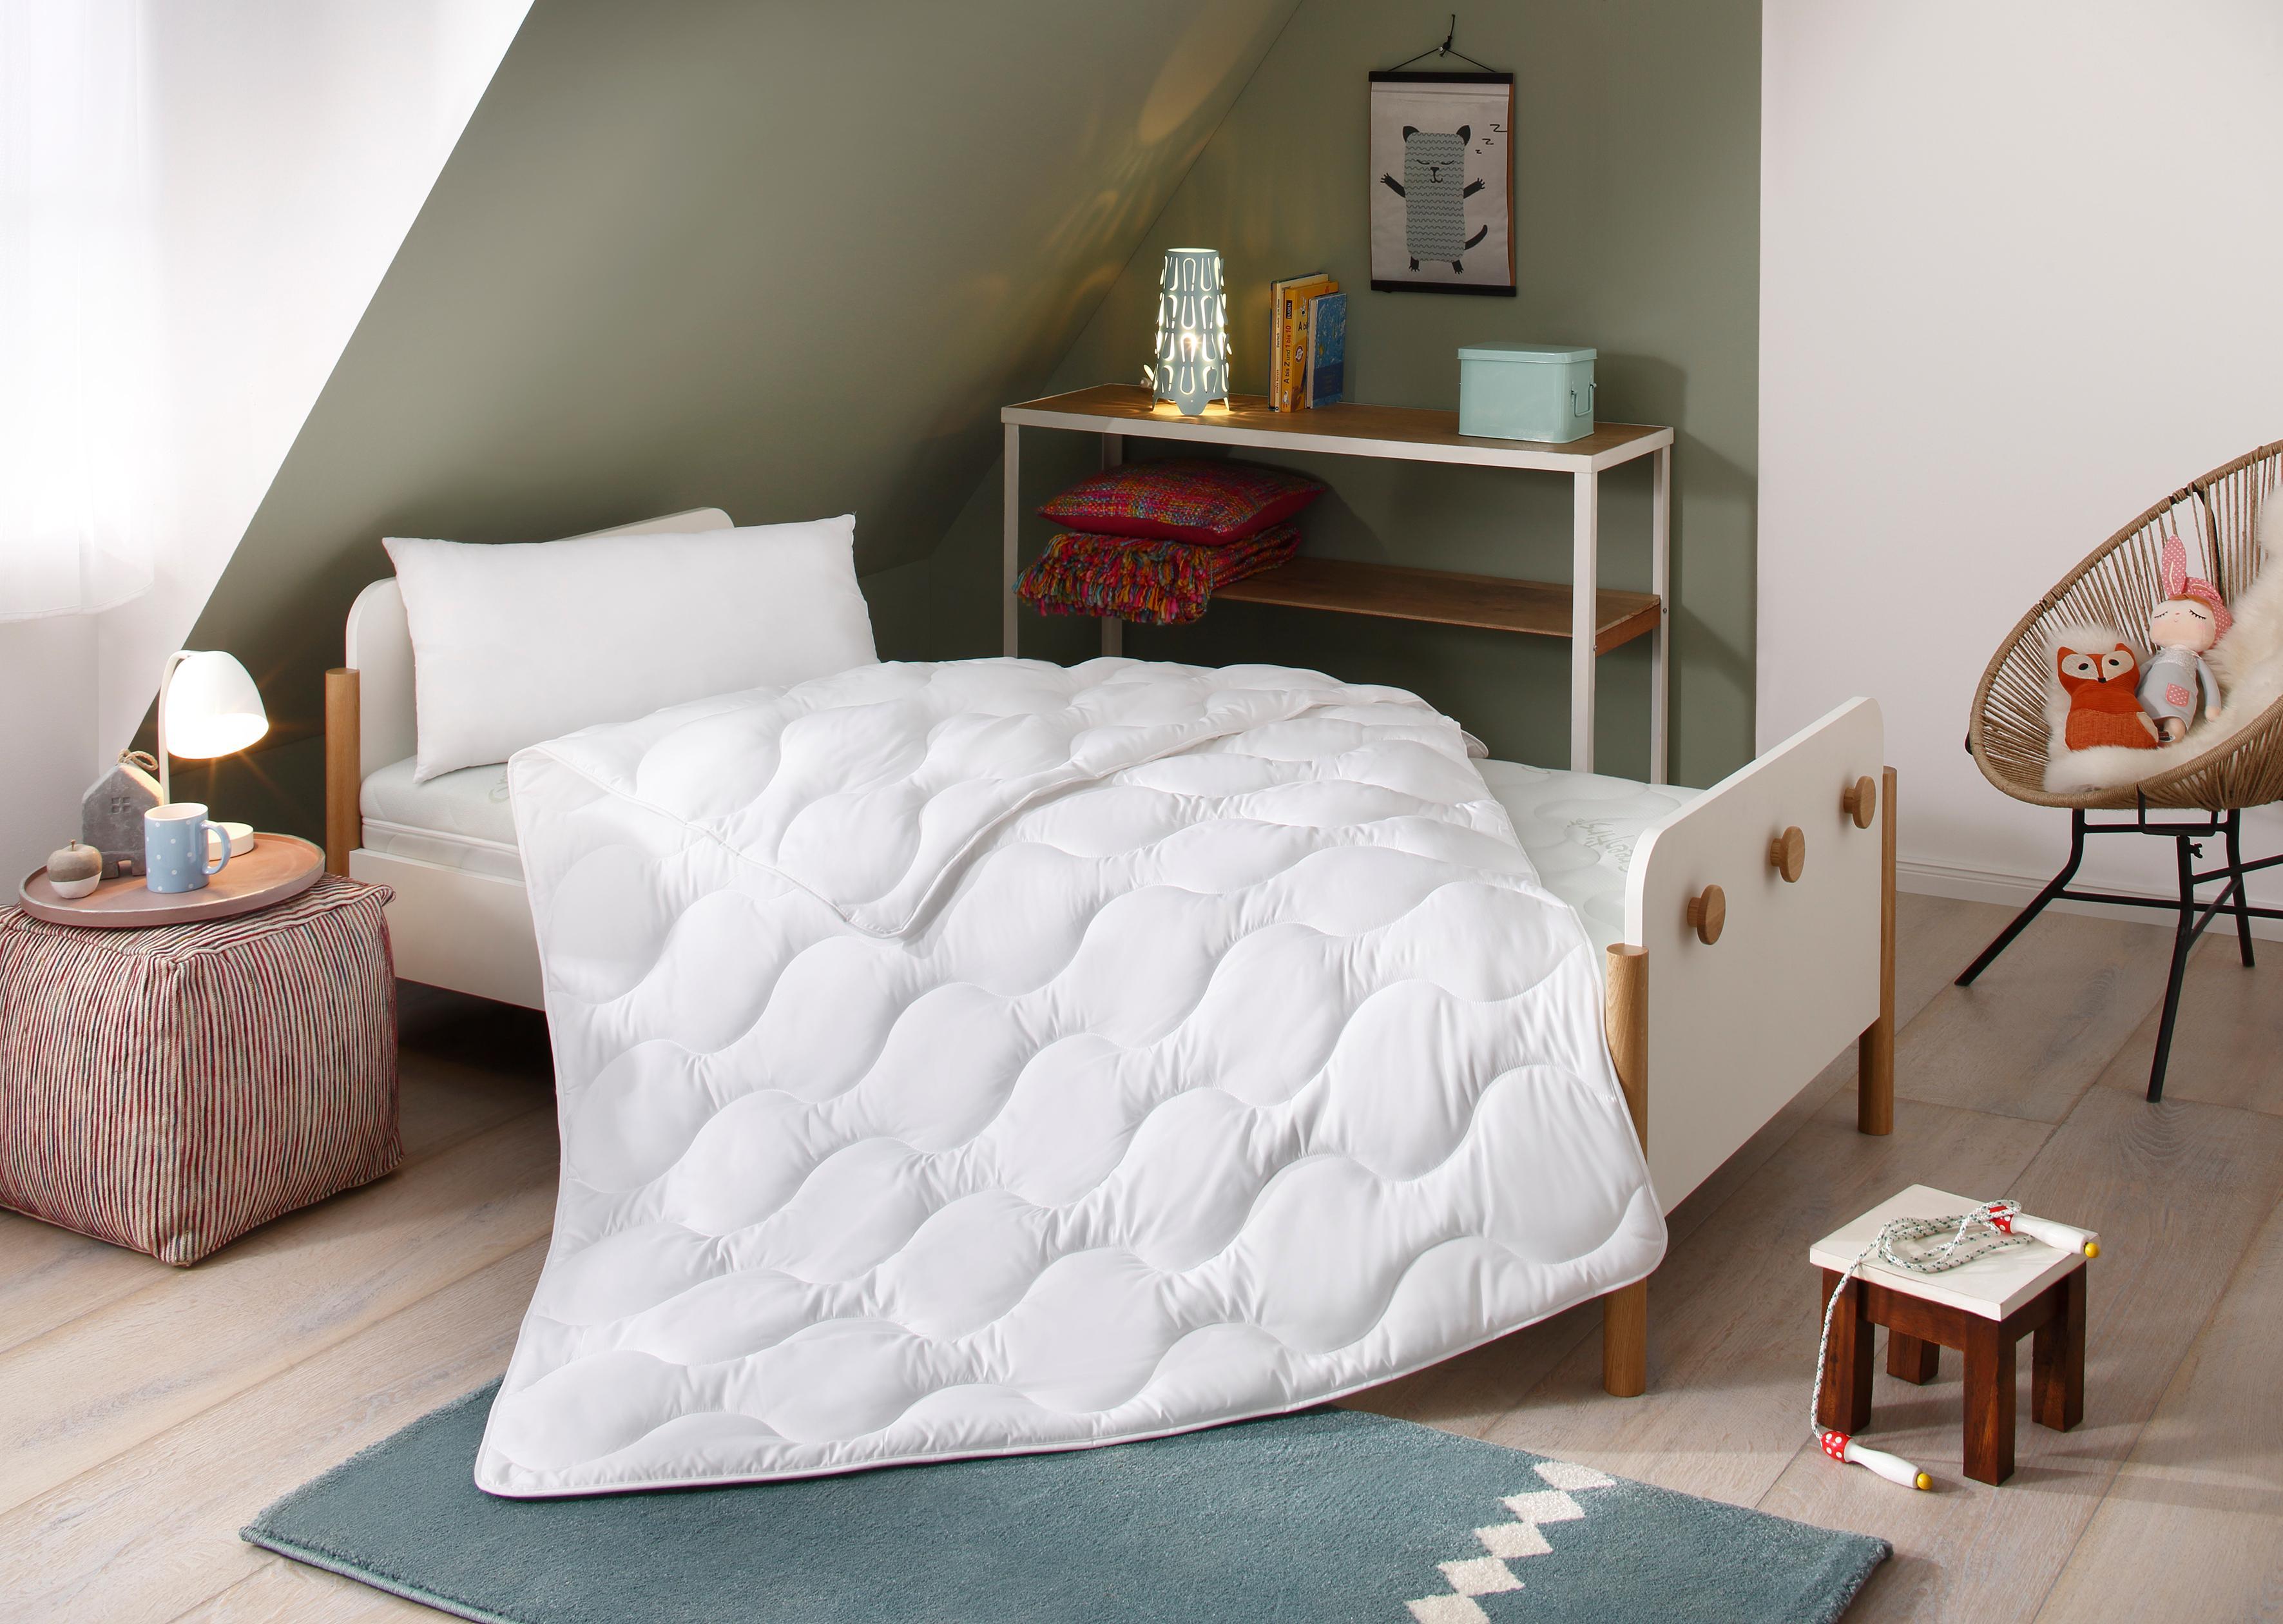 Kinderbettdecke + Kopfkissen Micro Lüttenhütt normal